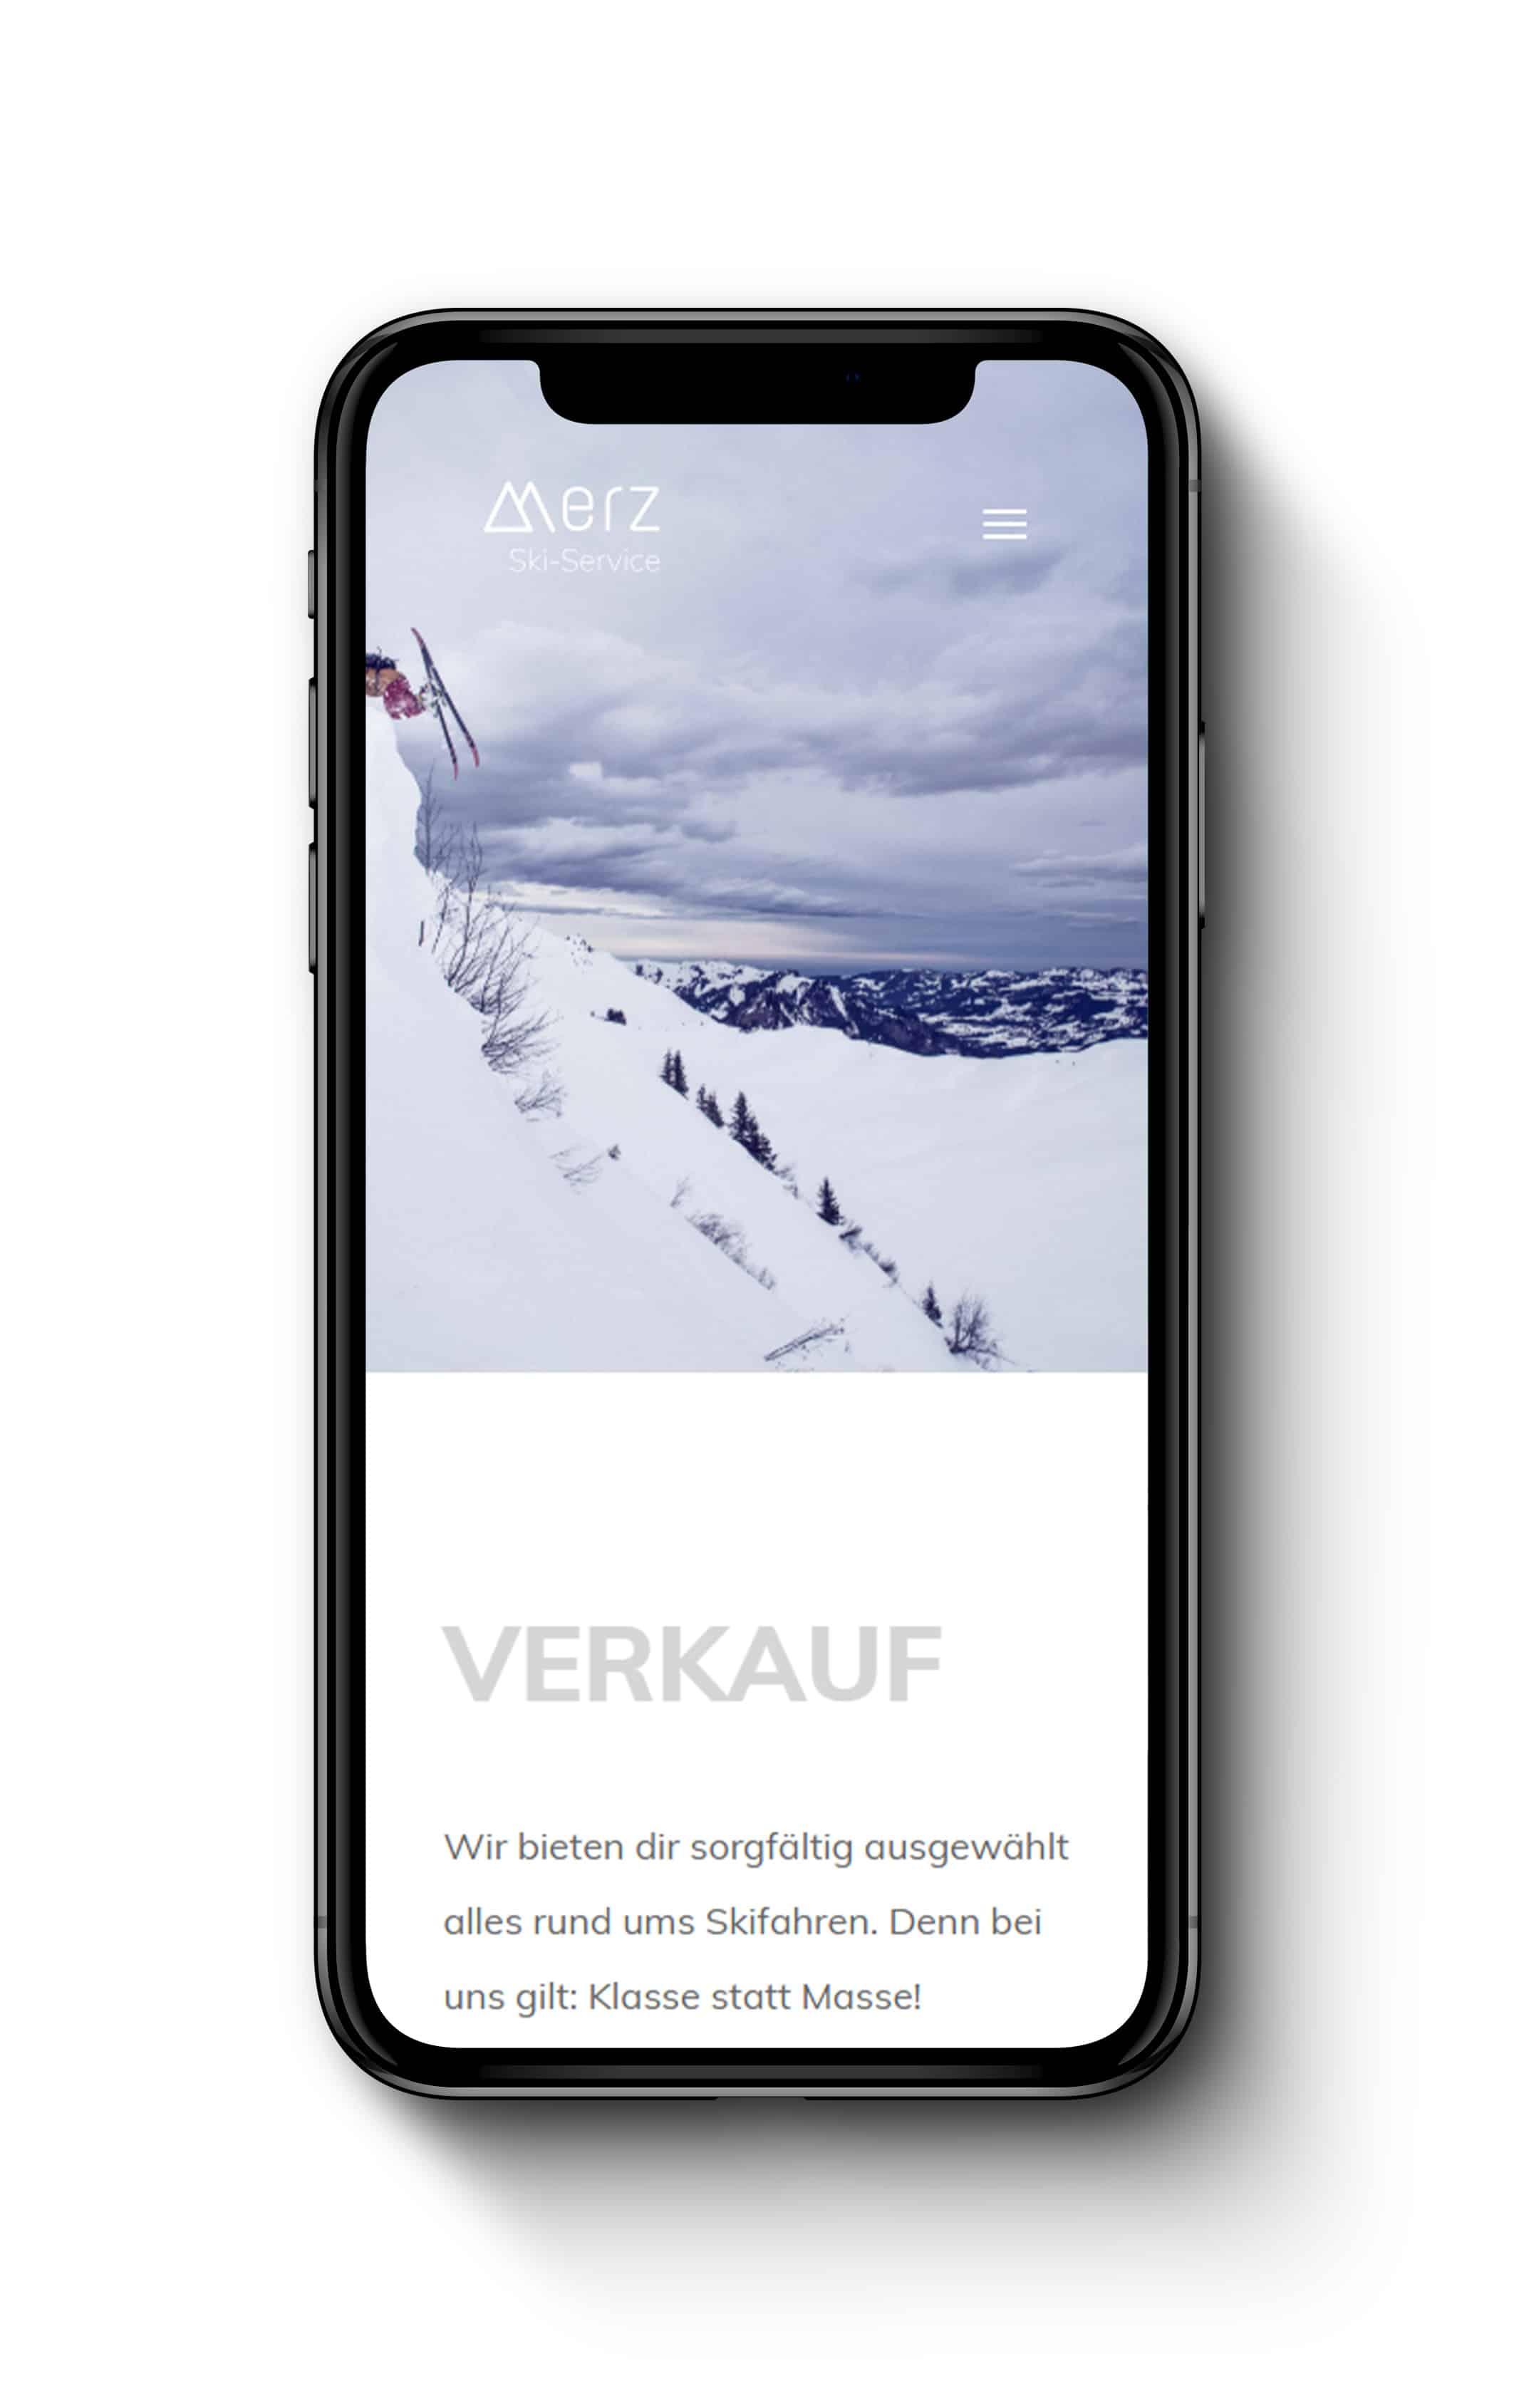 moritz-hamberger_slackline-skifahren-design_mockup merz_mockup-merz